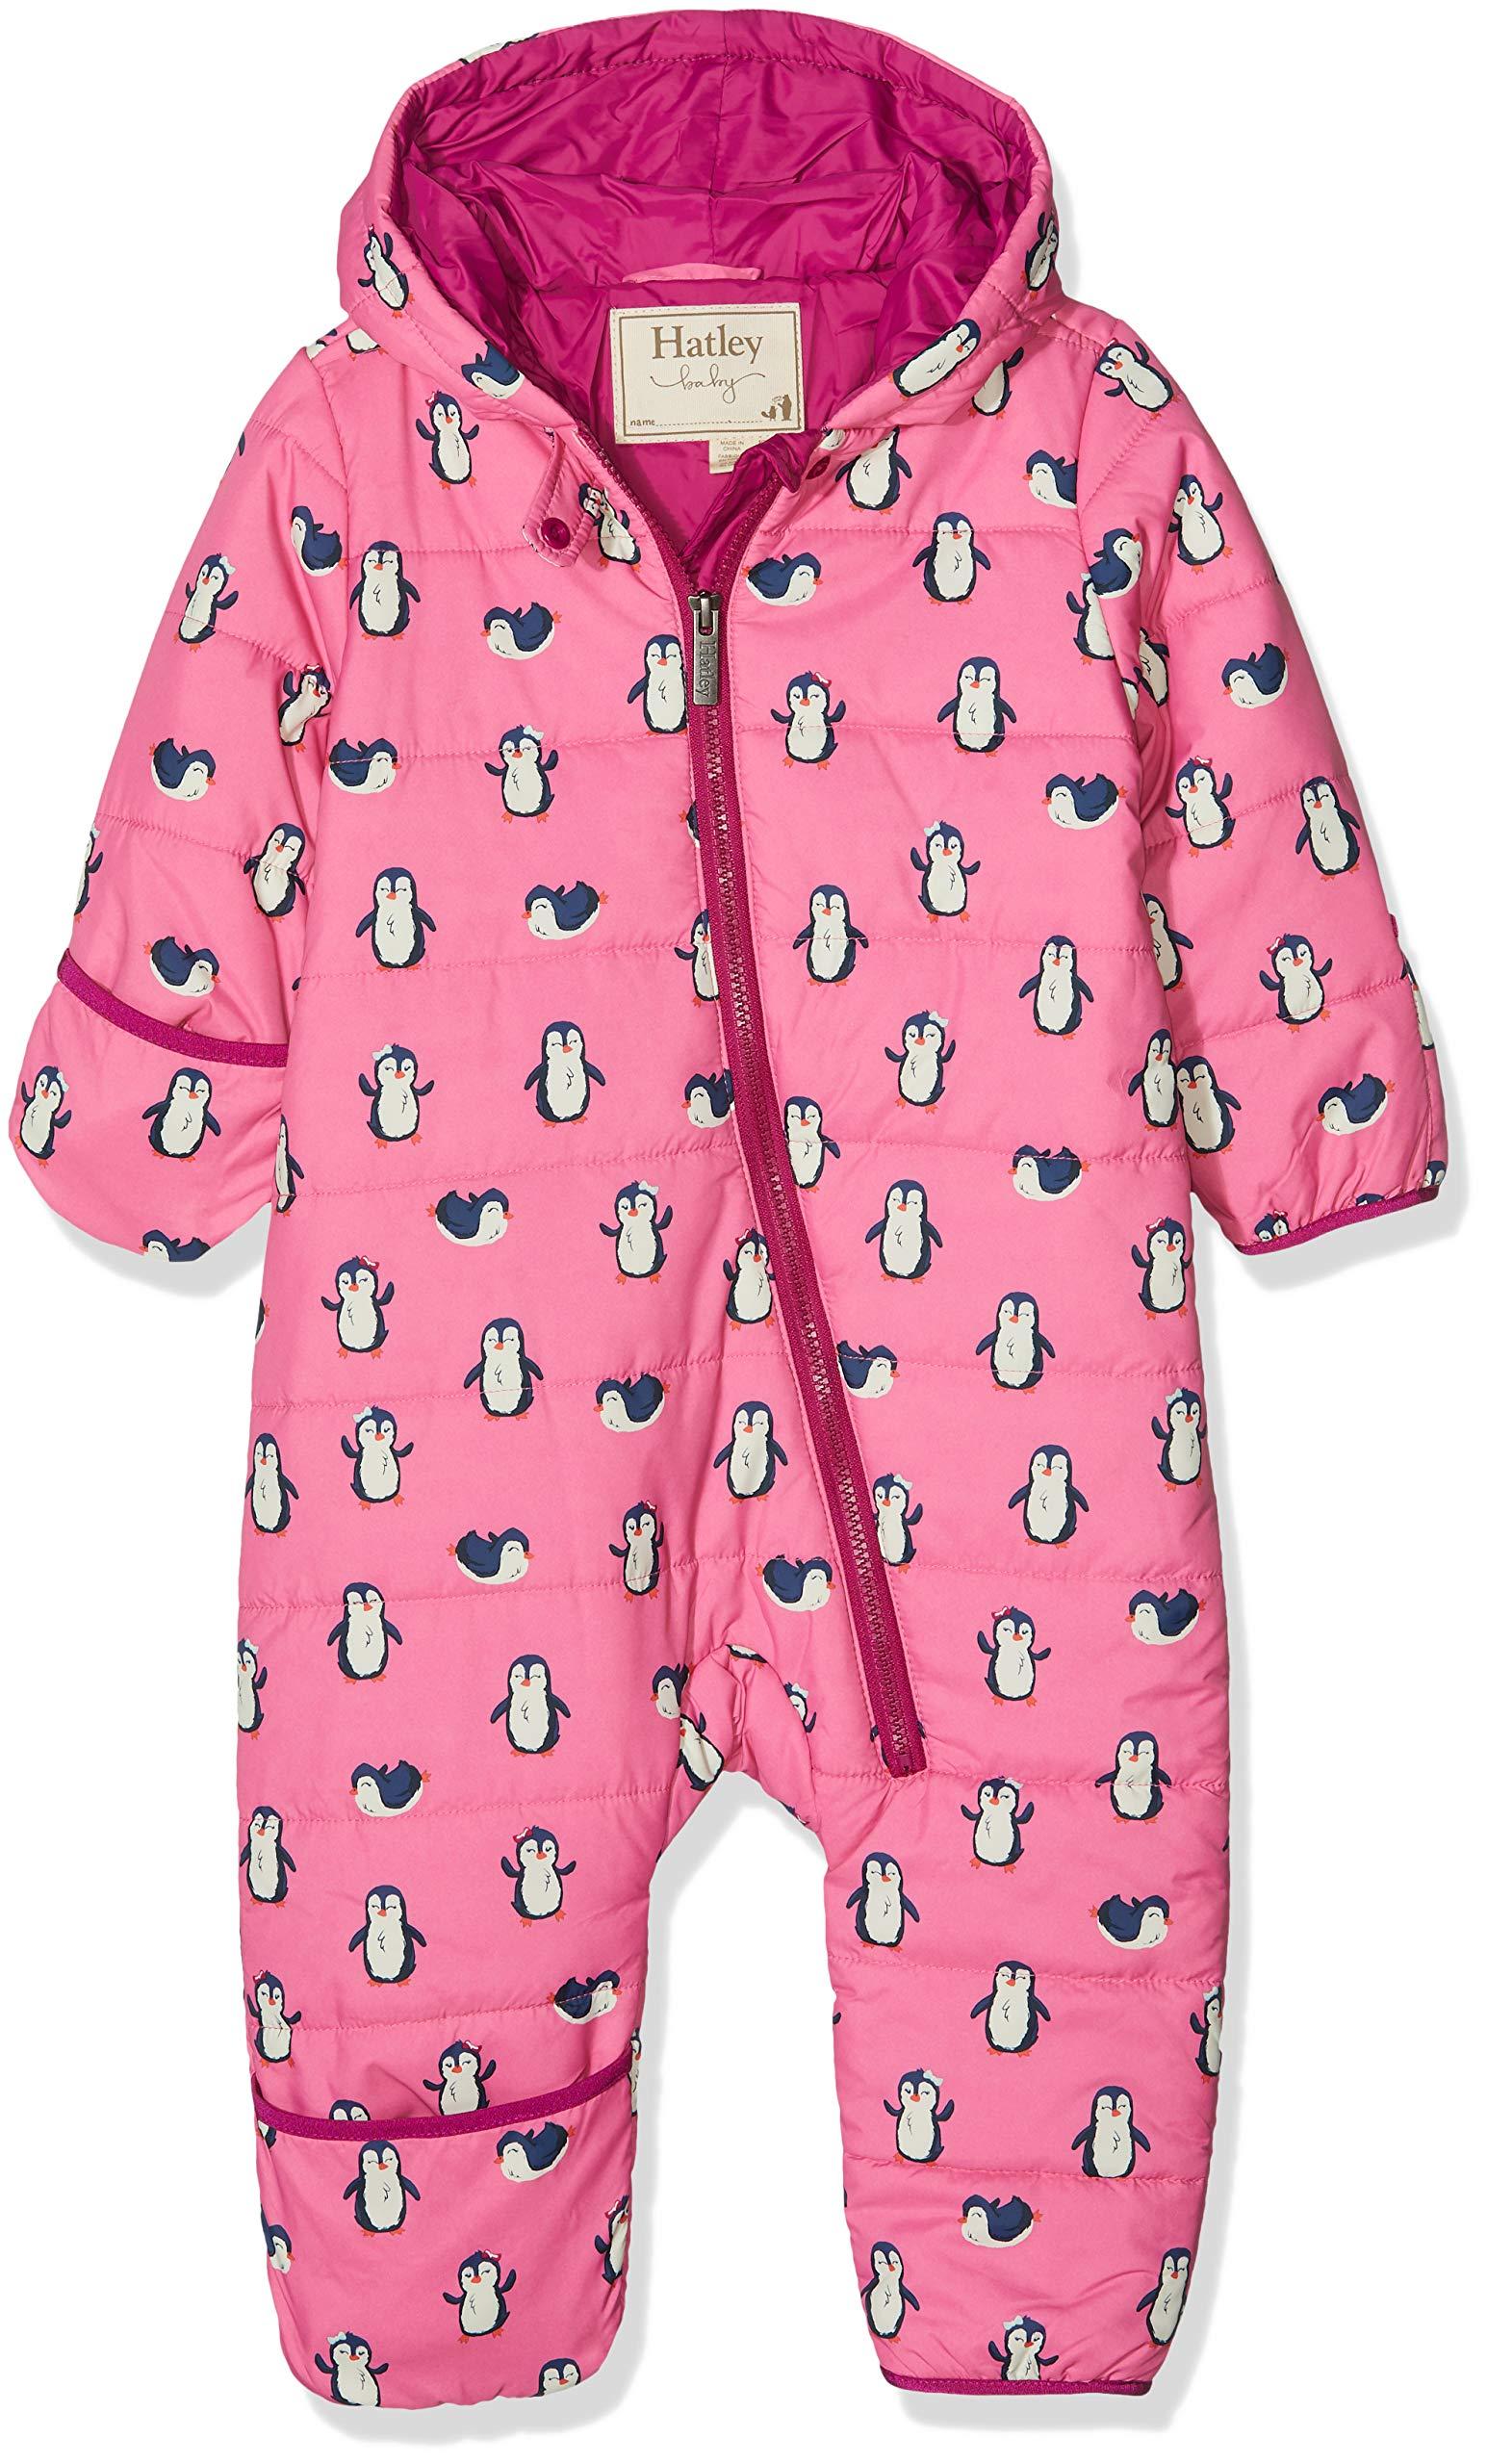 Hatley Baby Girls Winter Bundlers, Precious Penguin, 9-12 Months by Hatley